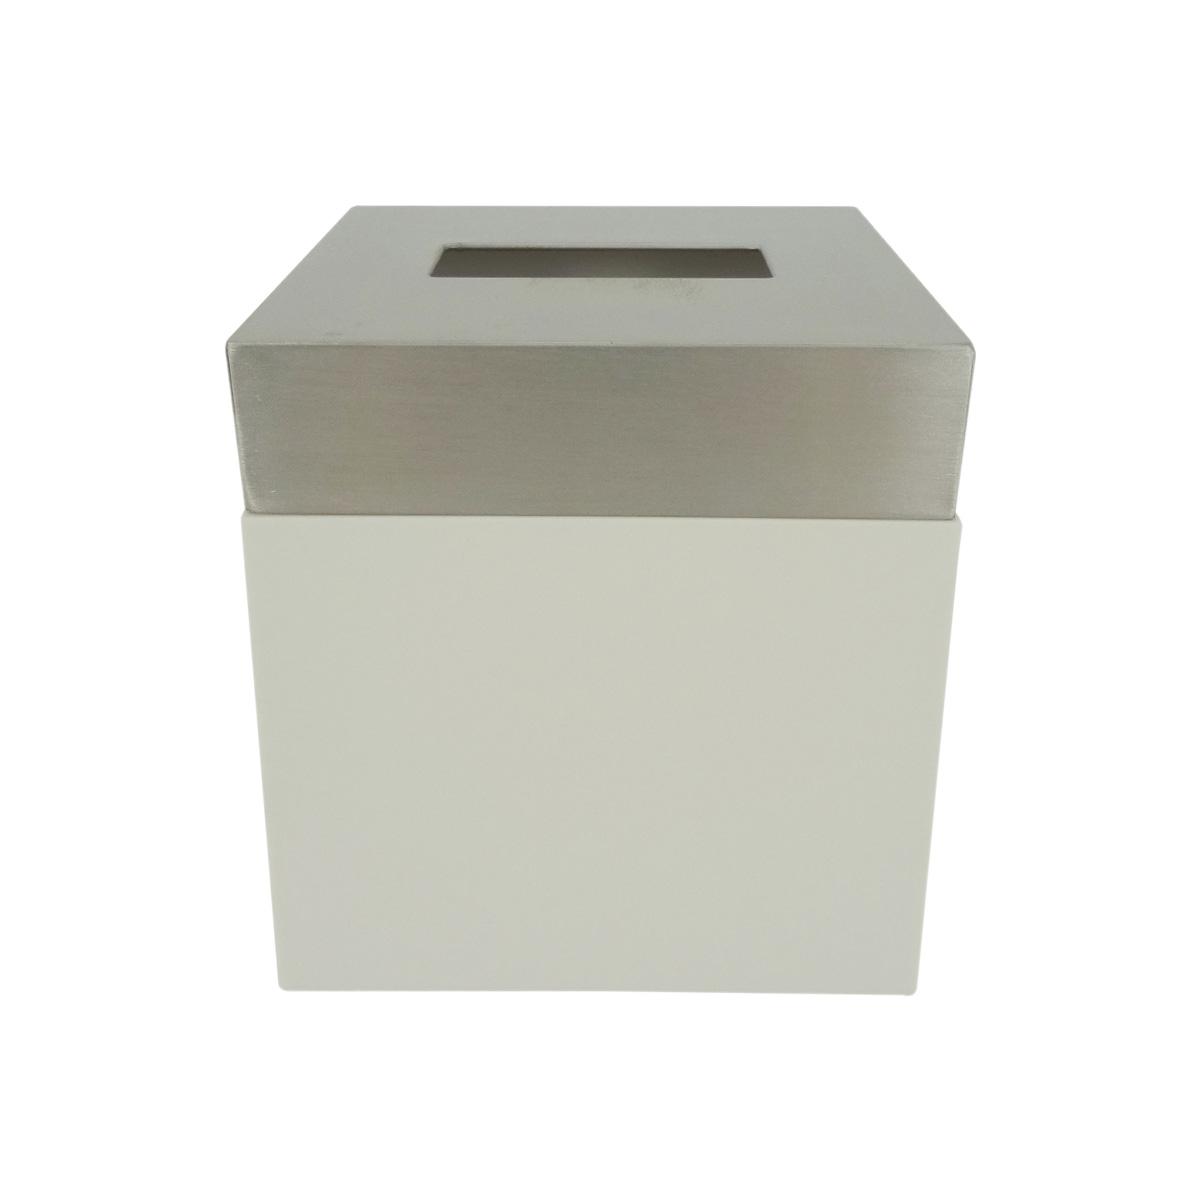 Porta Kleenex Acero Inoxidable Pvc Blanco BA-423249 Namaro Design